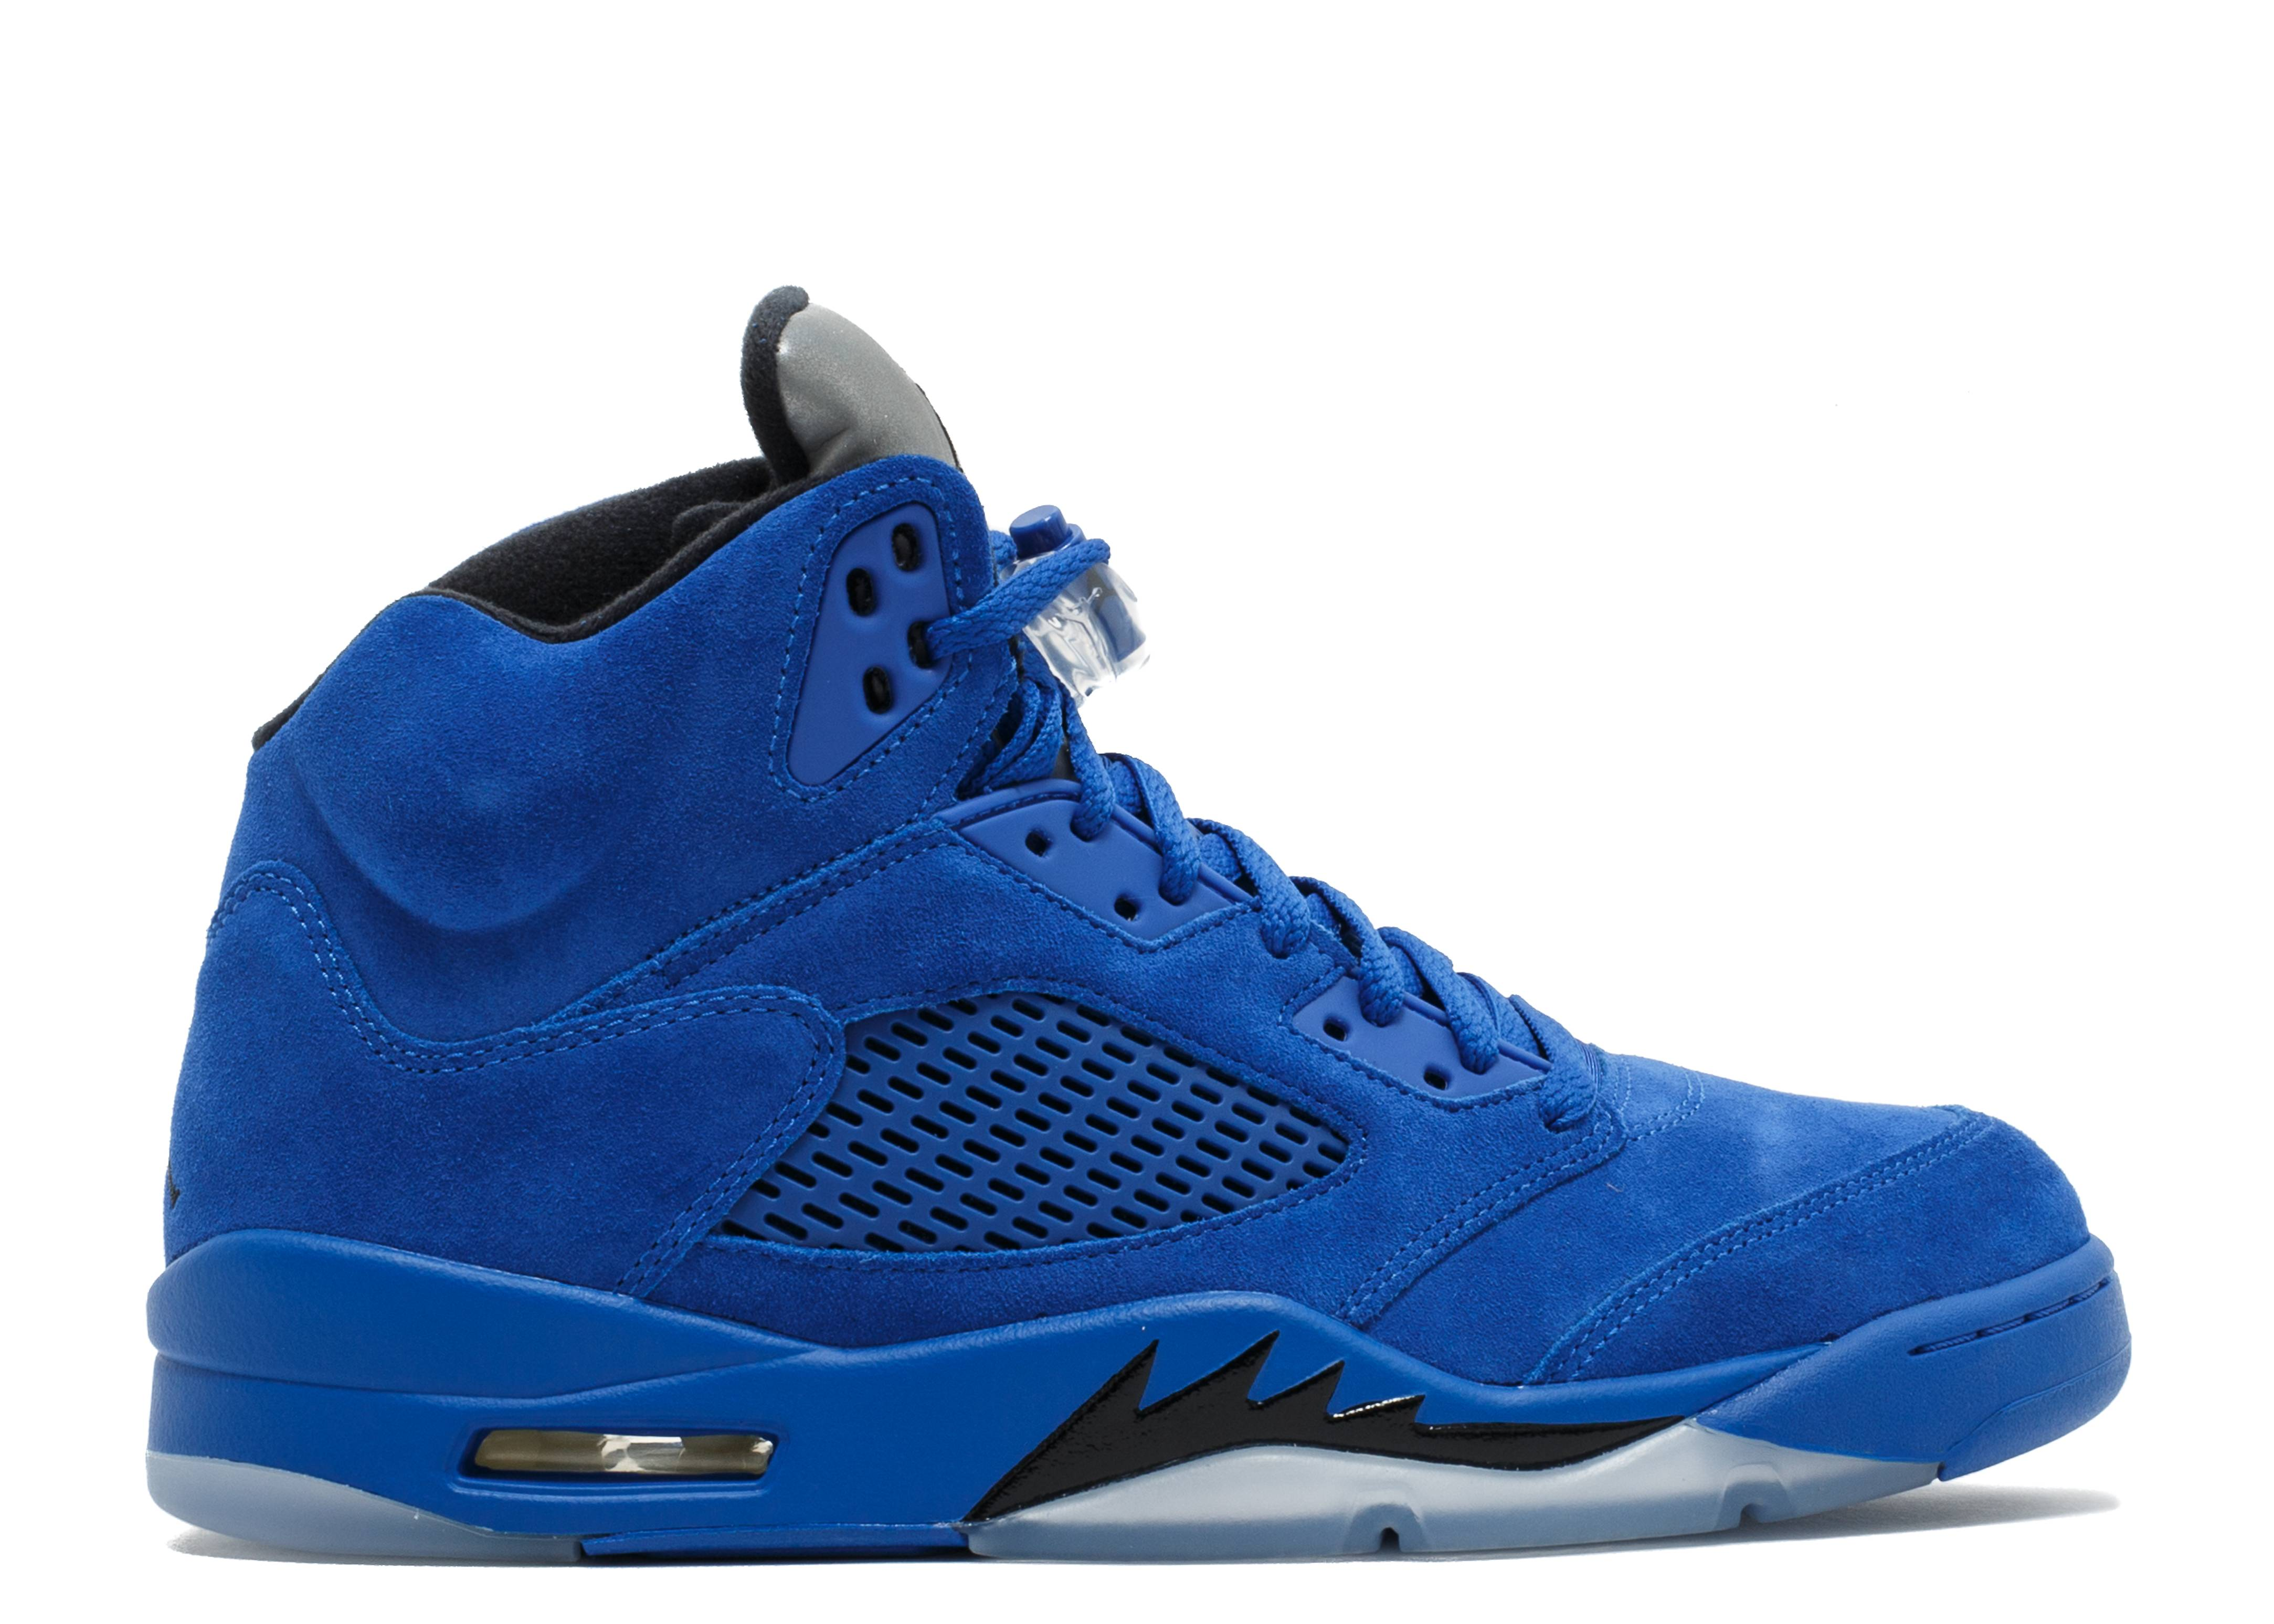 Air Jordan 5 Retro 'Blue Suede'